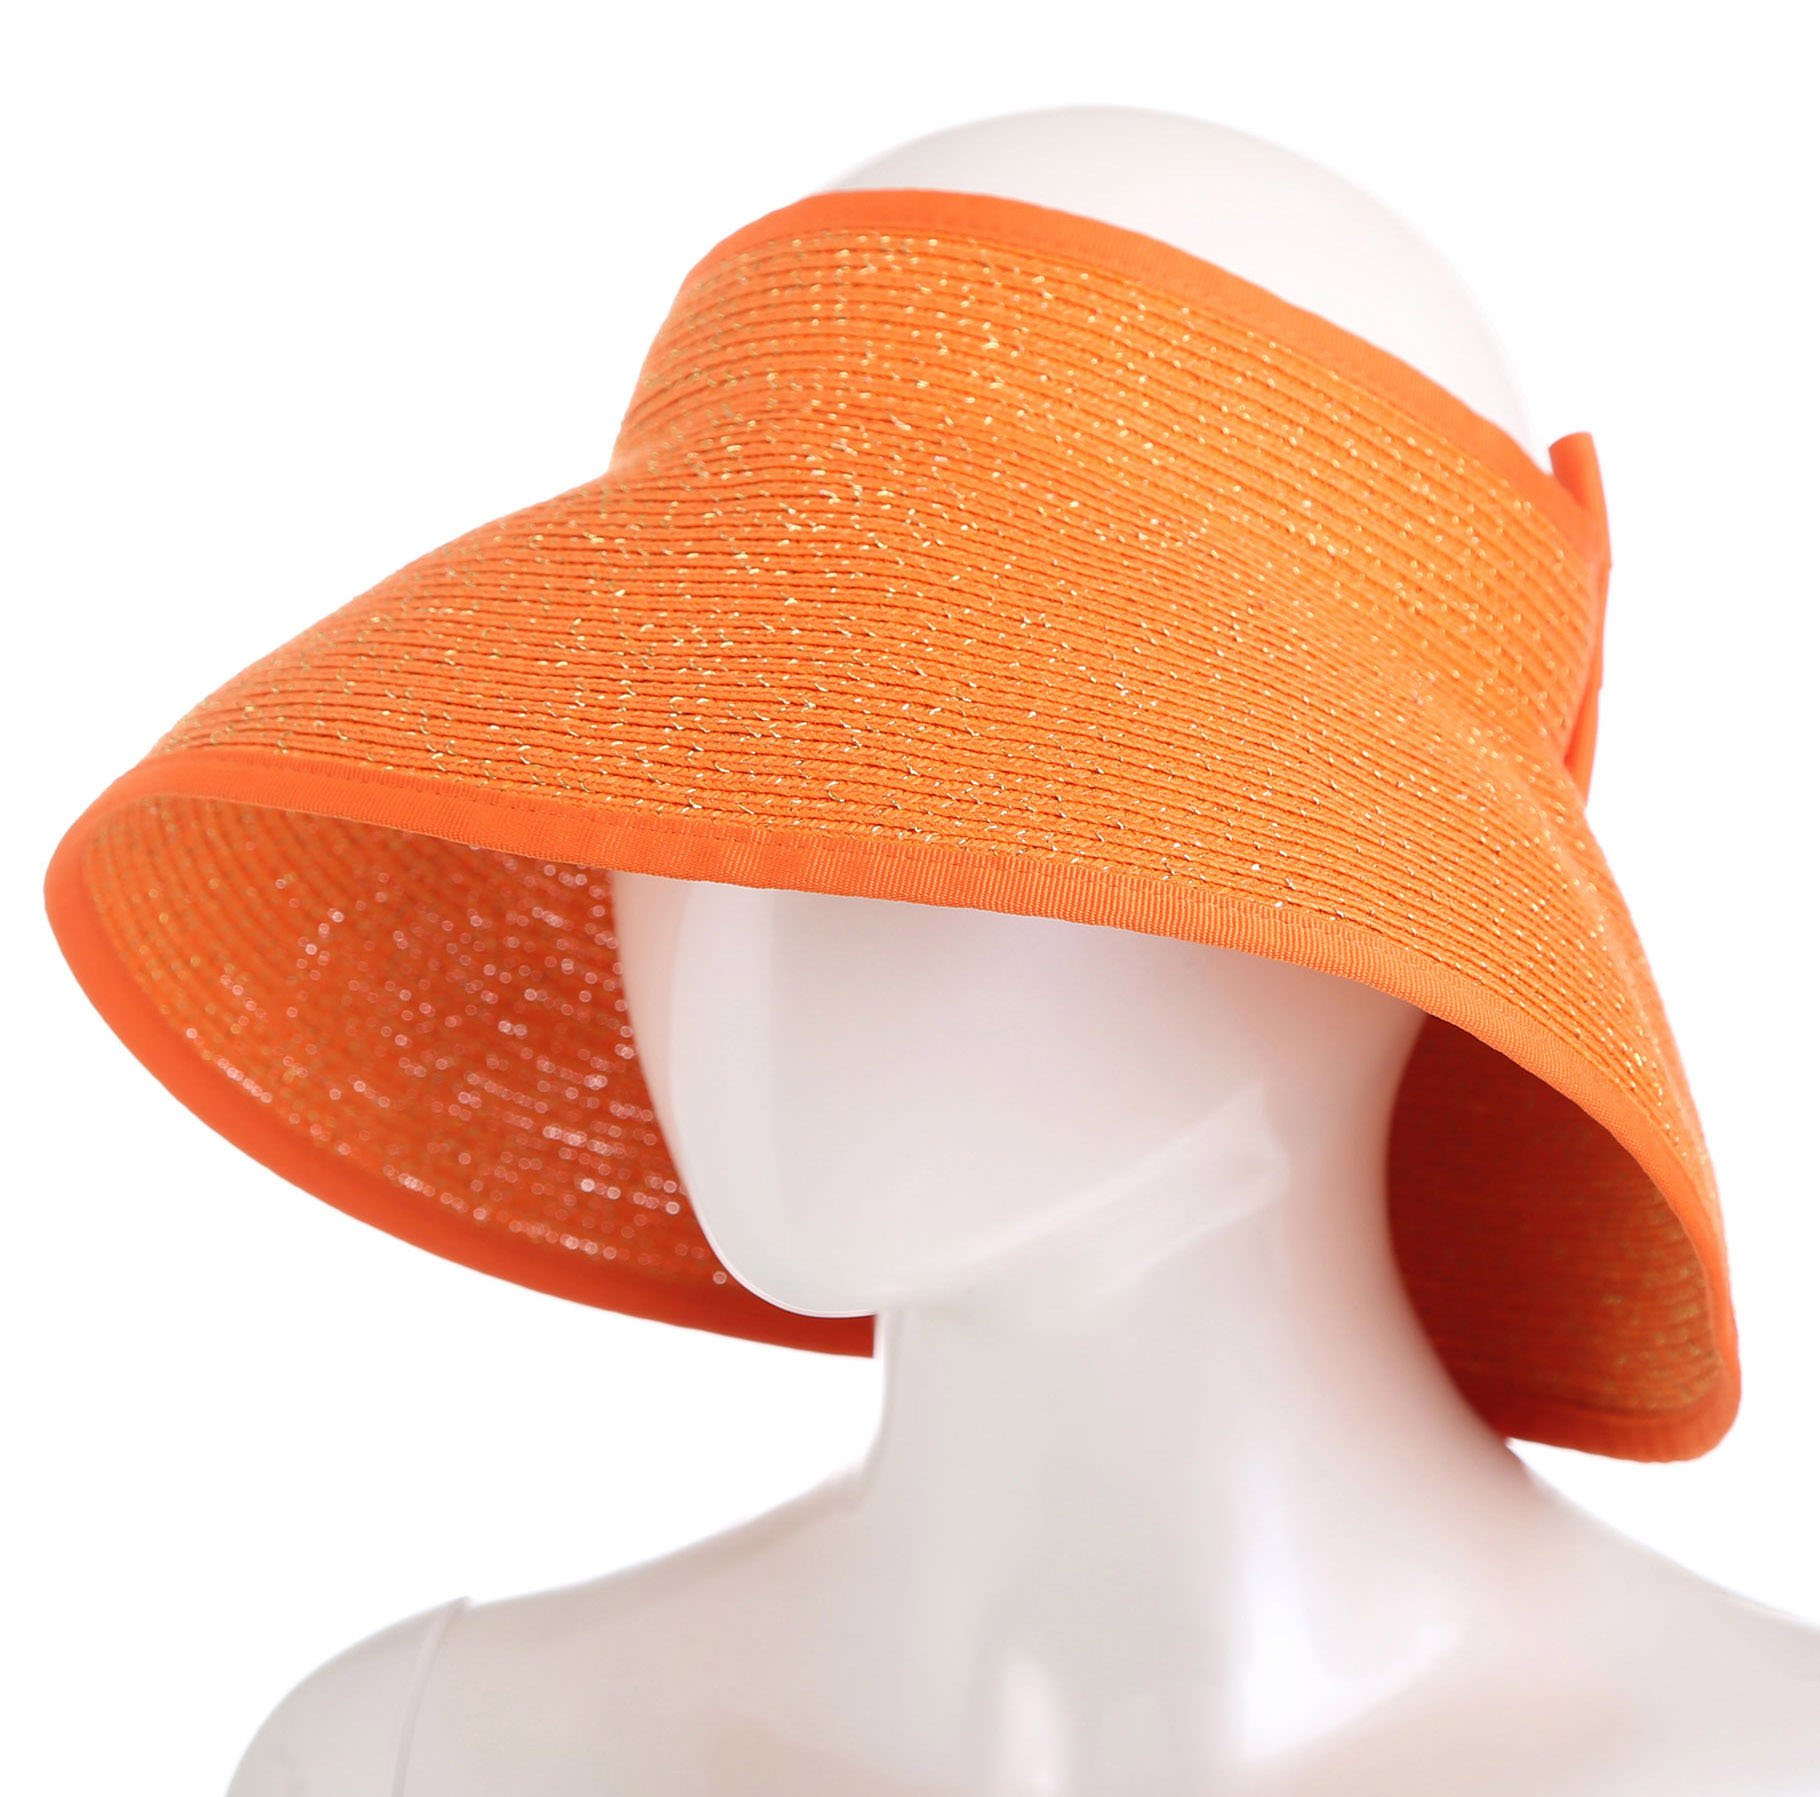 SunviewGolf svg Women's Summer Sun Golf Visor Beach Straw Hats Wide Brim Foldable Orange